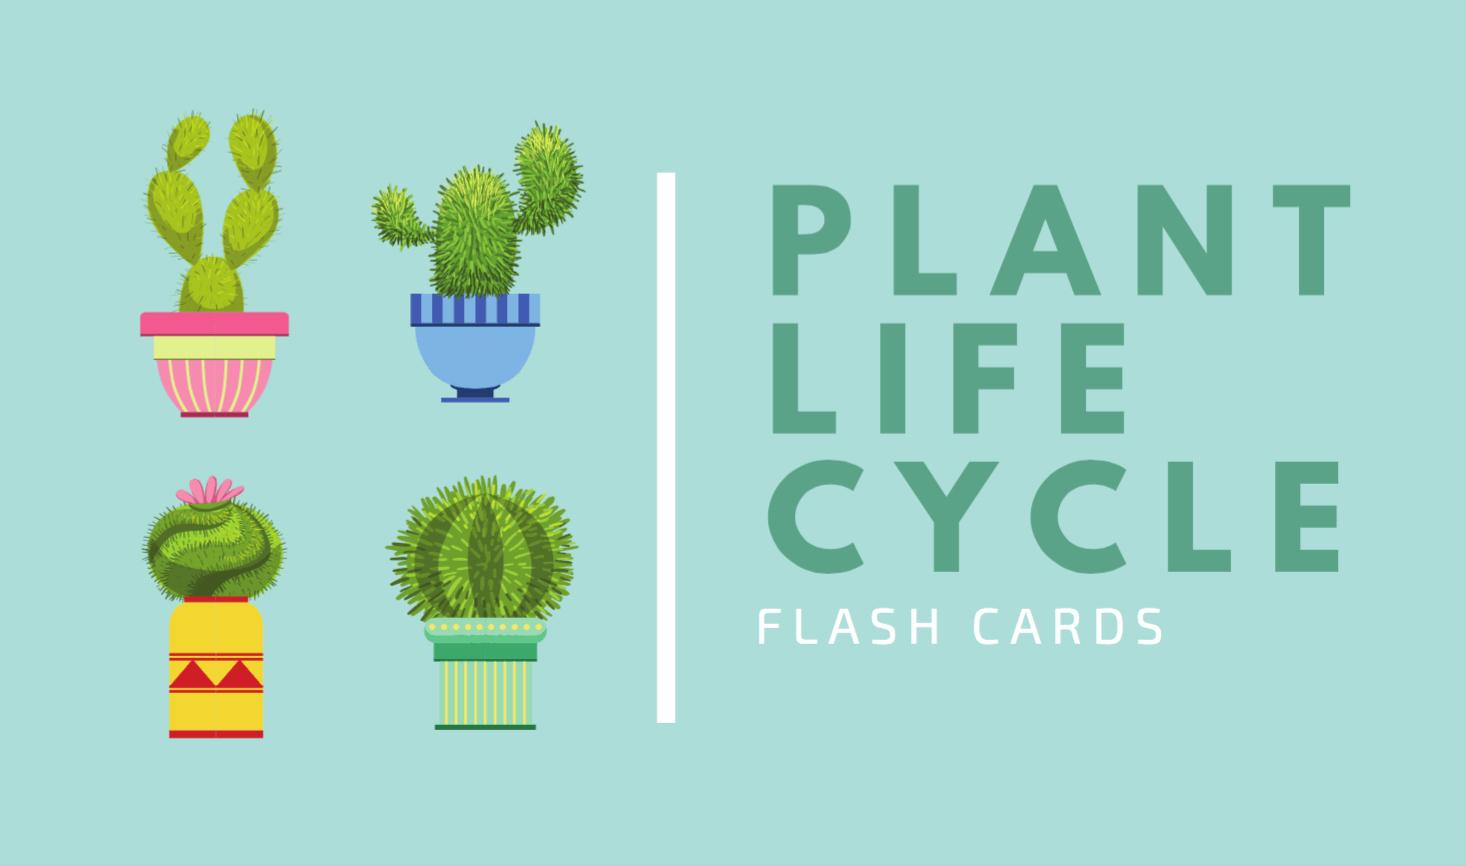 Free Online Flashcard Maker: Design Custom Flashcards - Canva - Free Printable Flash Card Maker